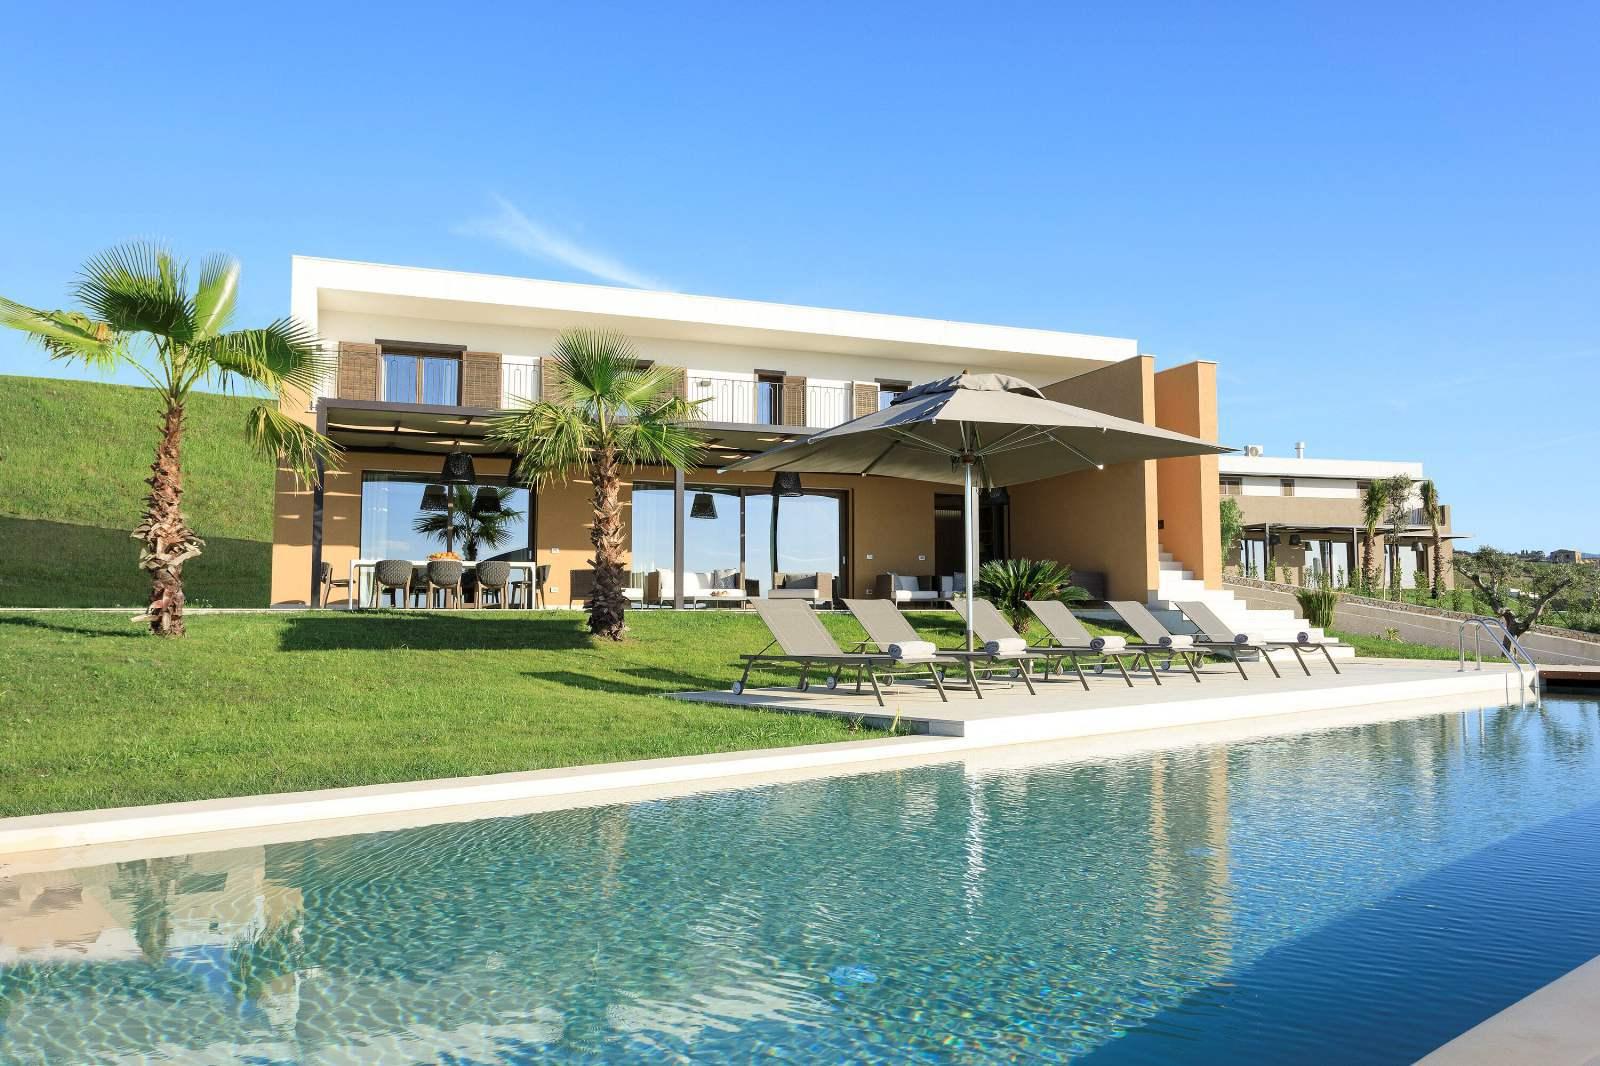 Verdura Resort: Private Villas: room / property / locale photo. Image 15